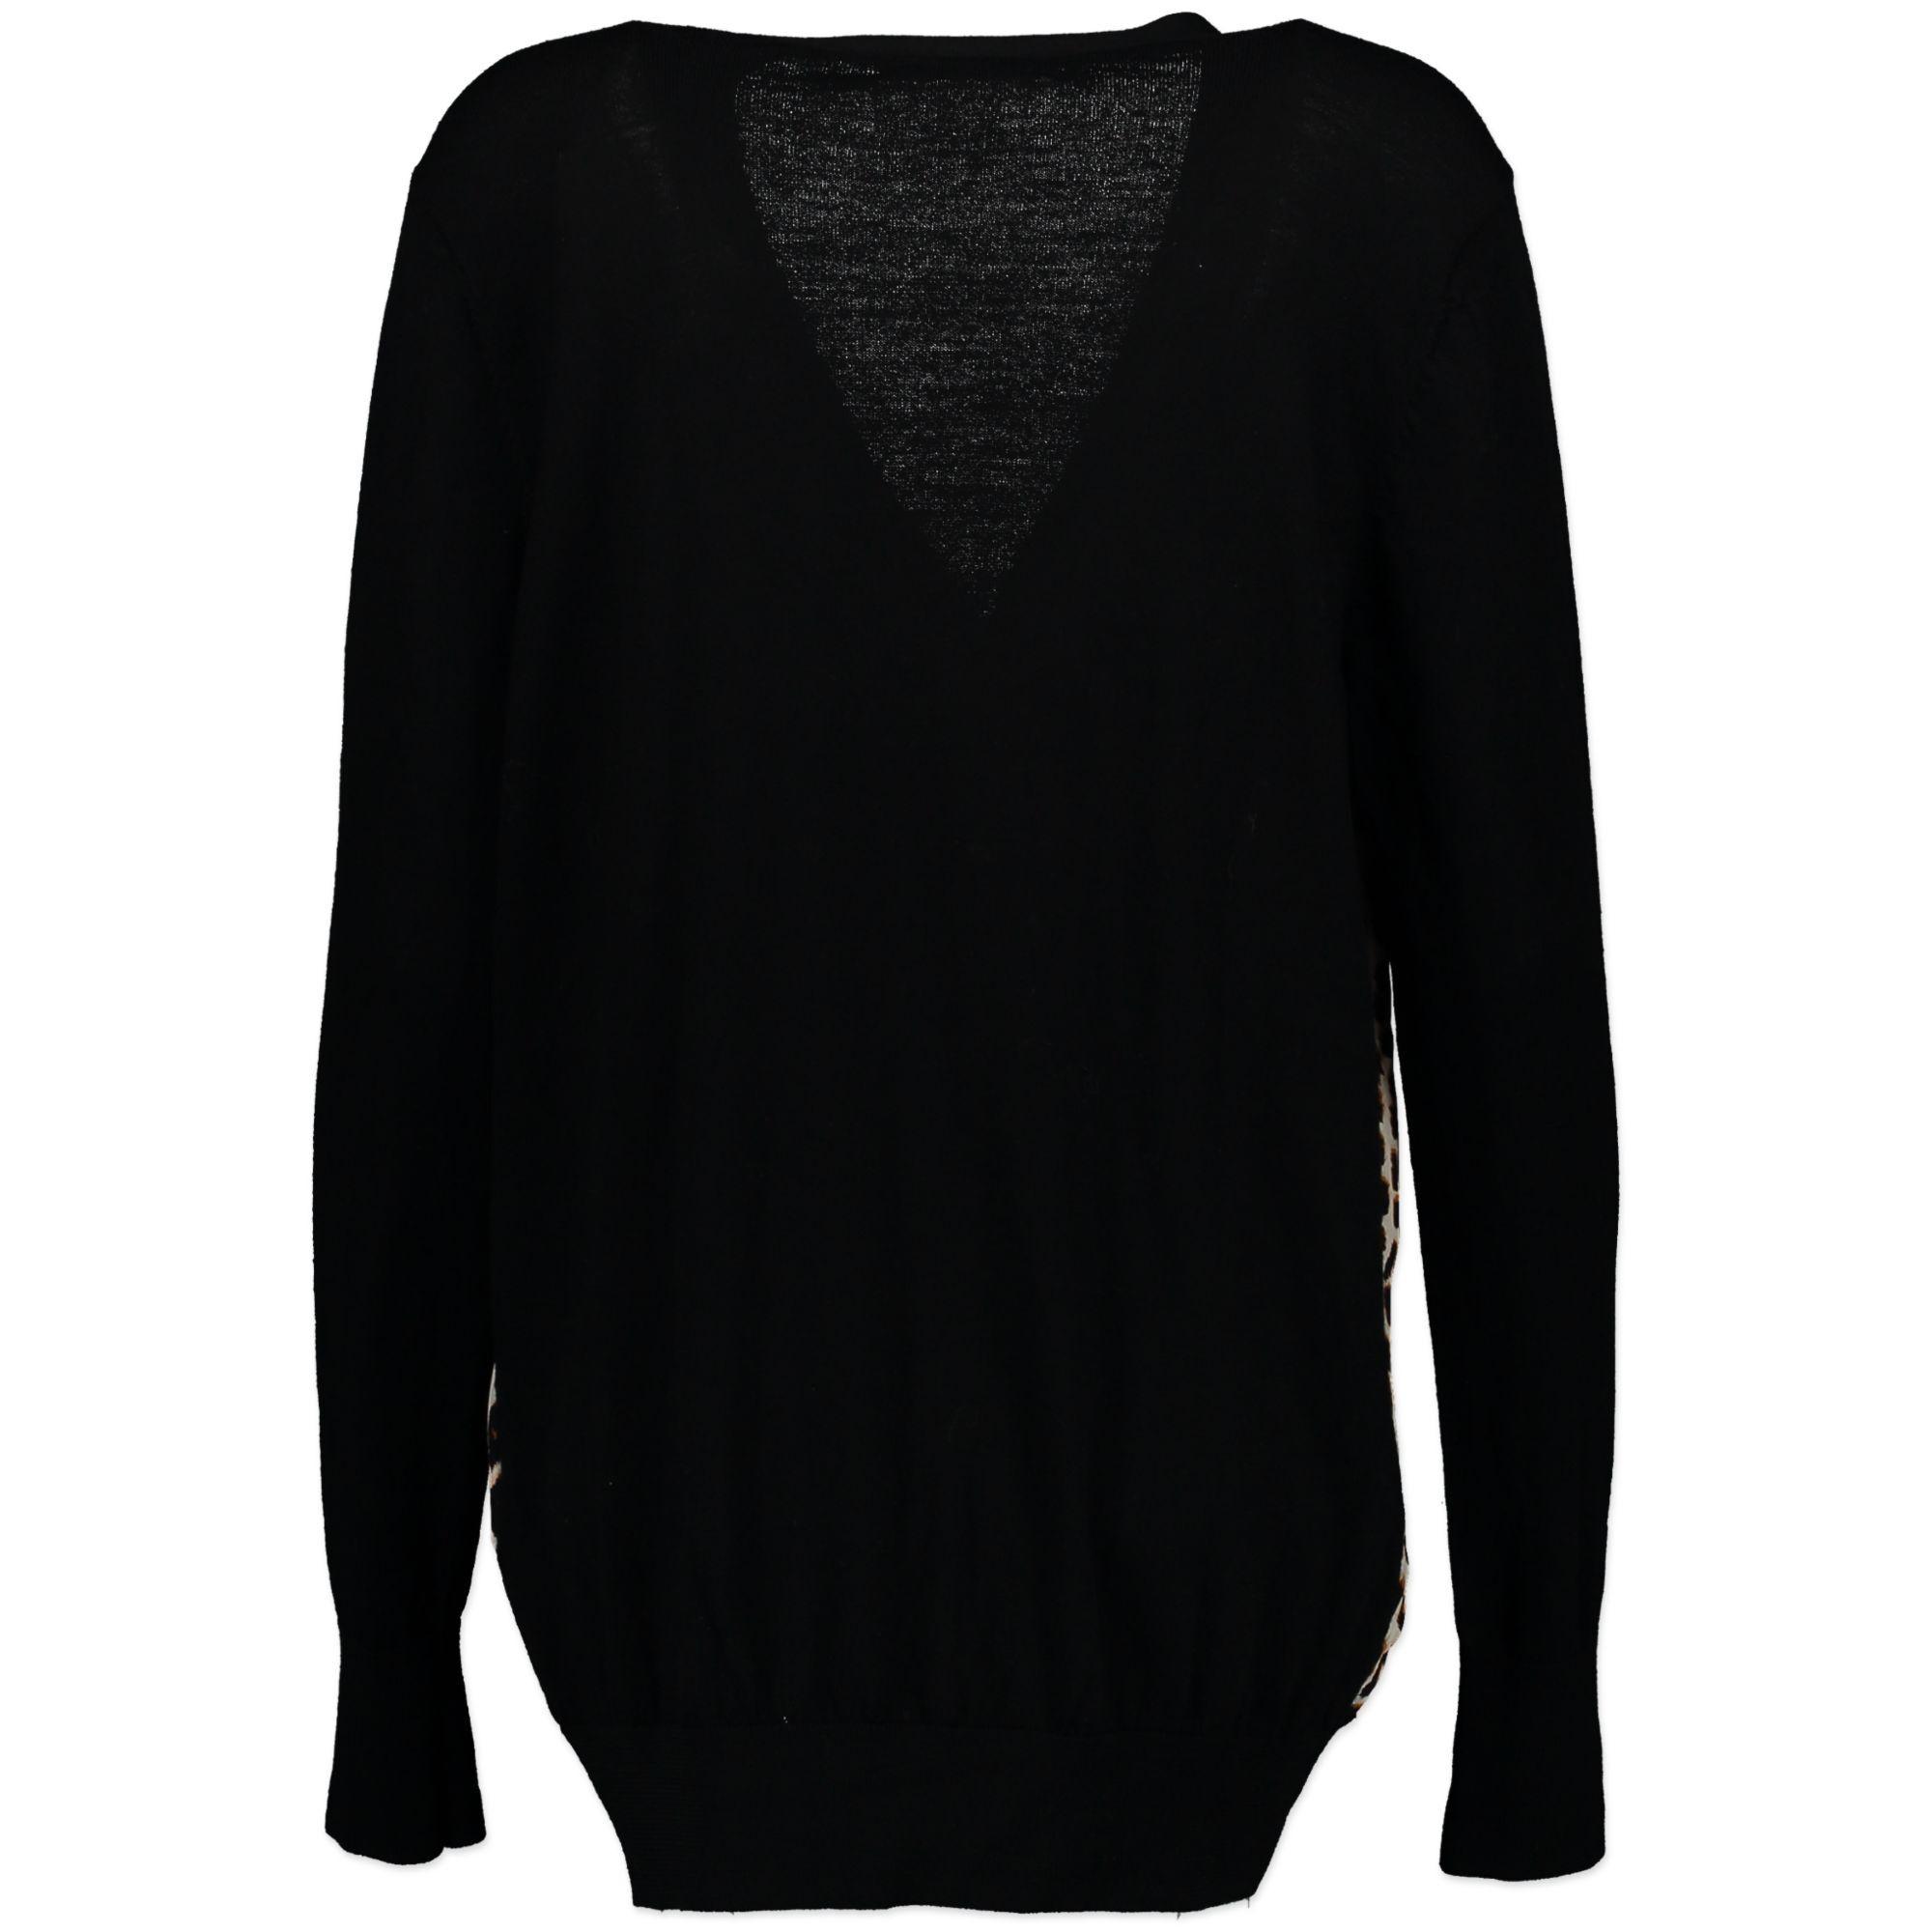 Equipment Cardigan Black Leopard - Size M. Buy authentic Equipment clothes online. Safe payment.